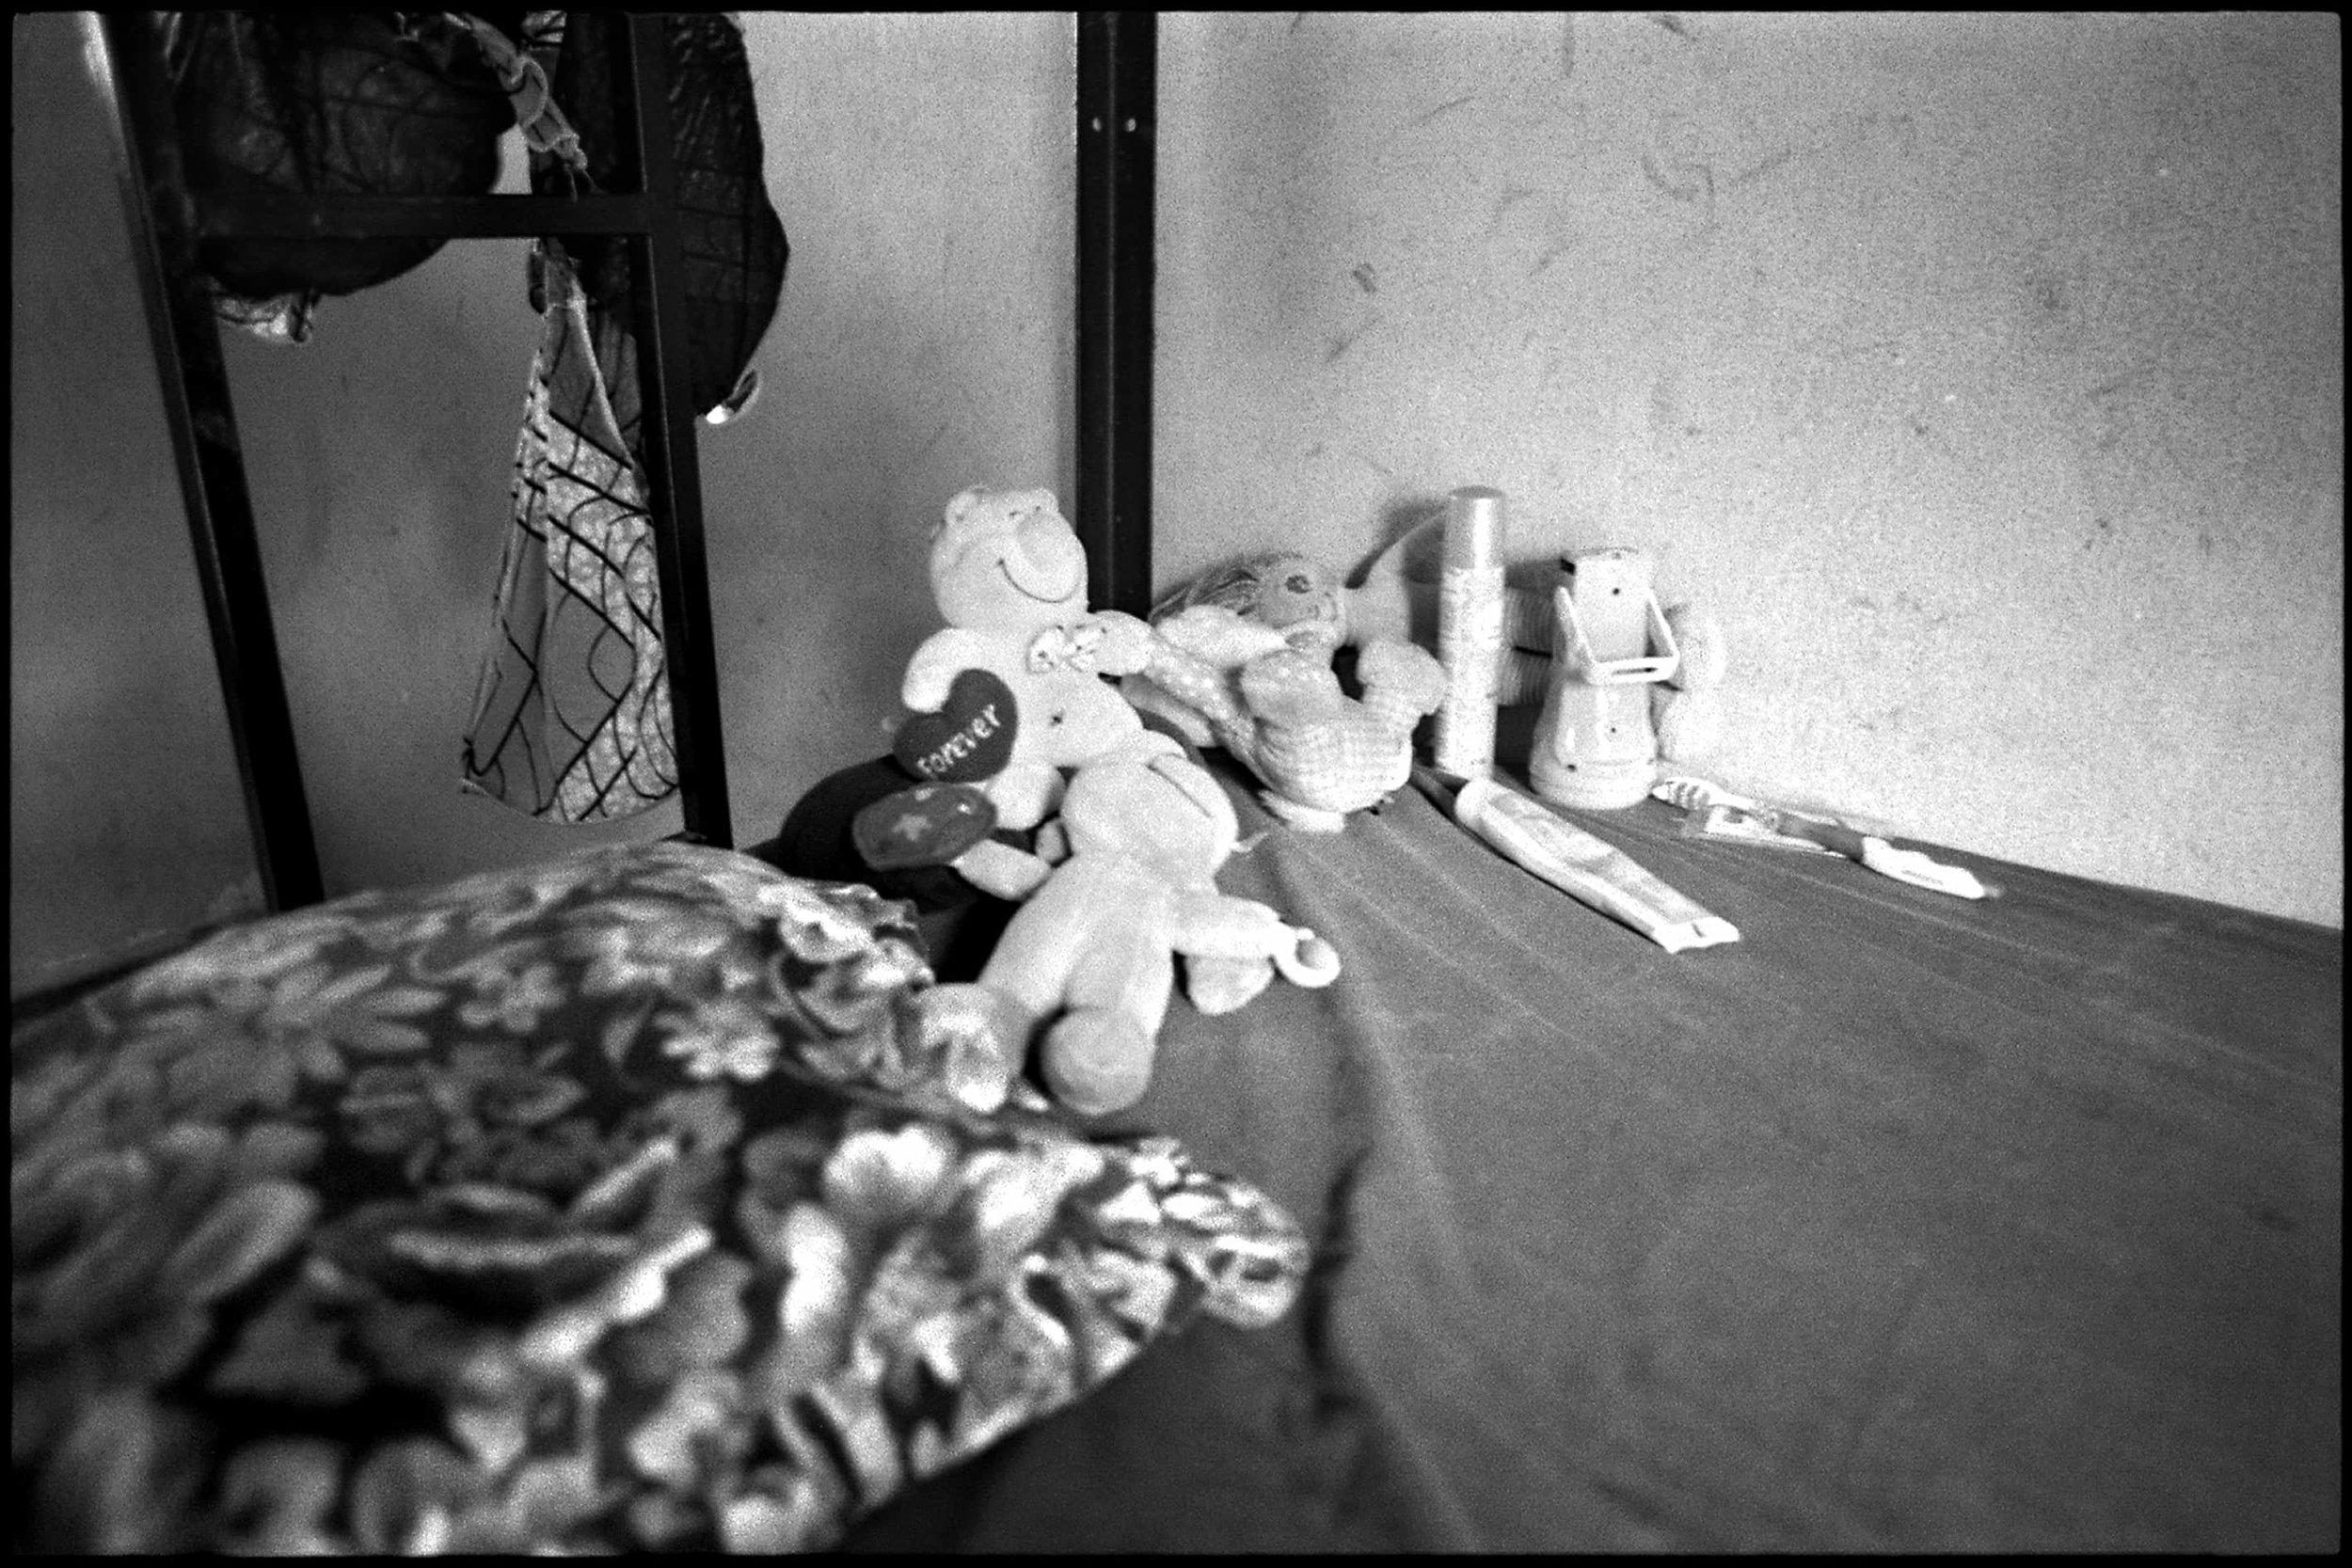 documentary-reportage-centre-les-archanges-fabio-burrelli-6.jpg